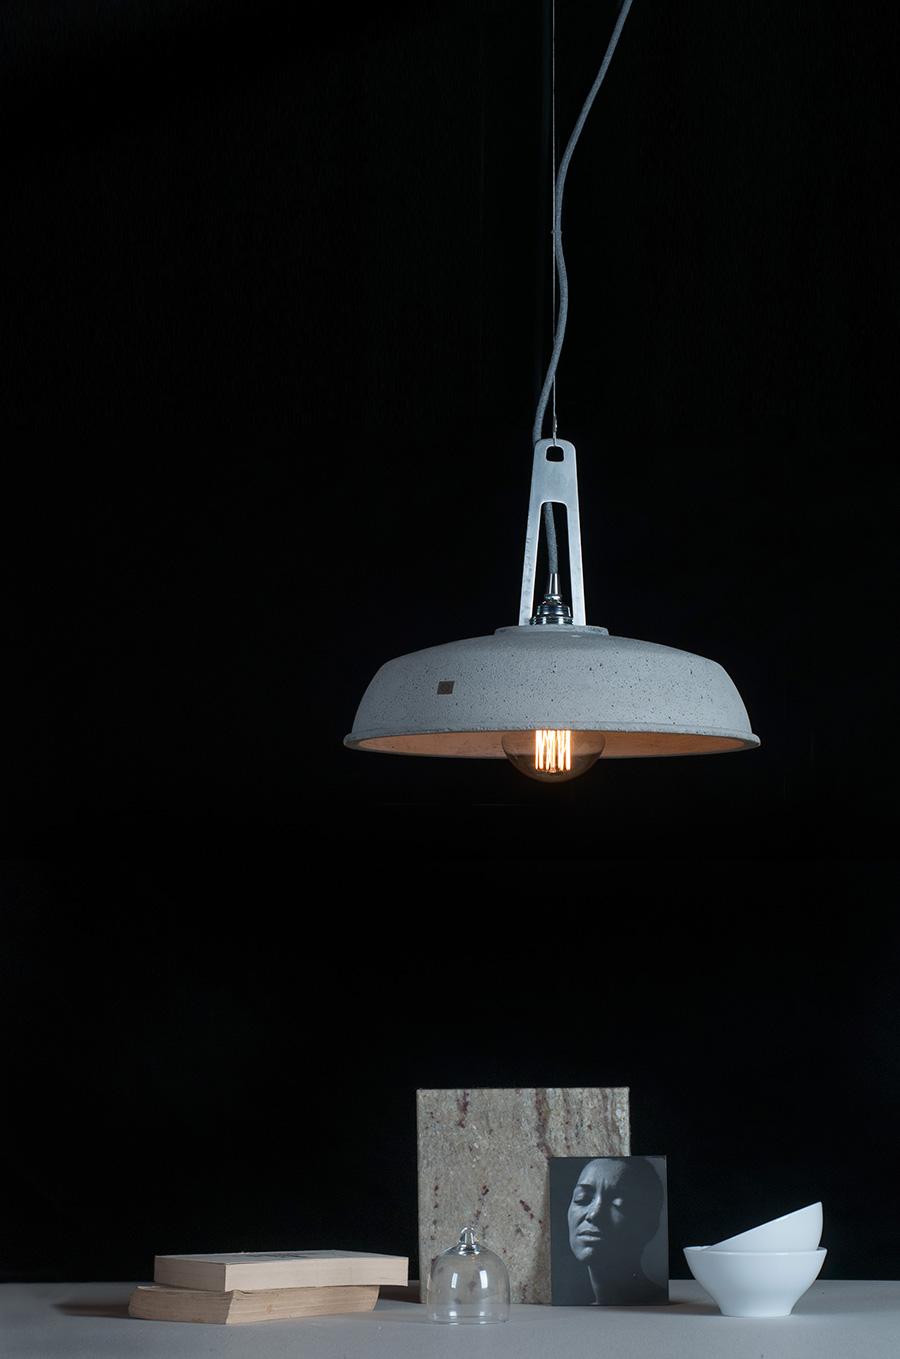 betonlampen sind der wahre hit der modernen industrial. Black Bedroom Furniture Sets. Home Design Ideas